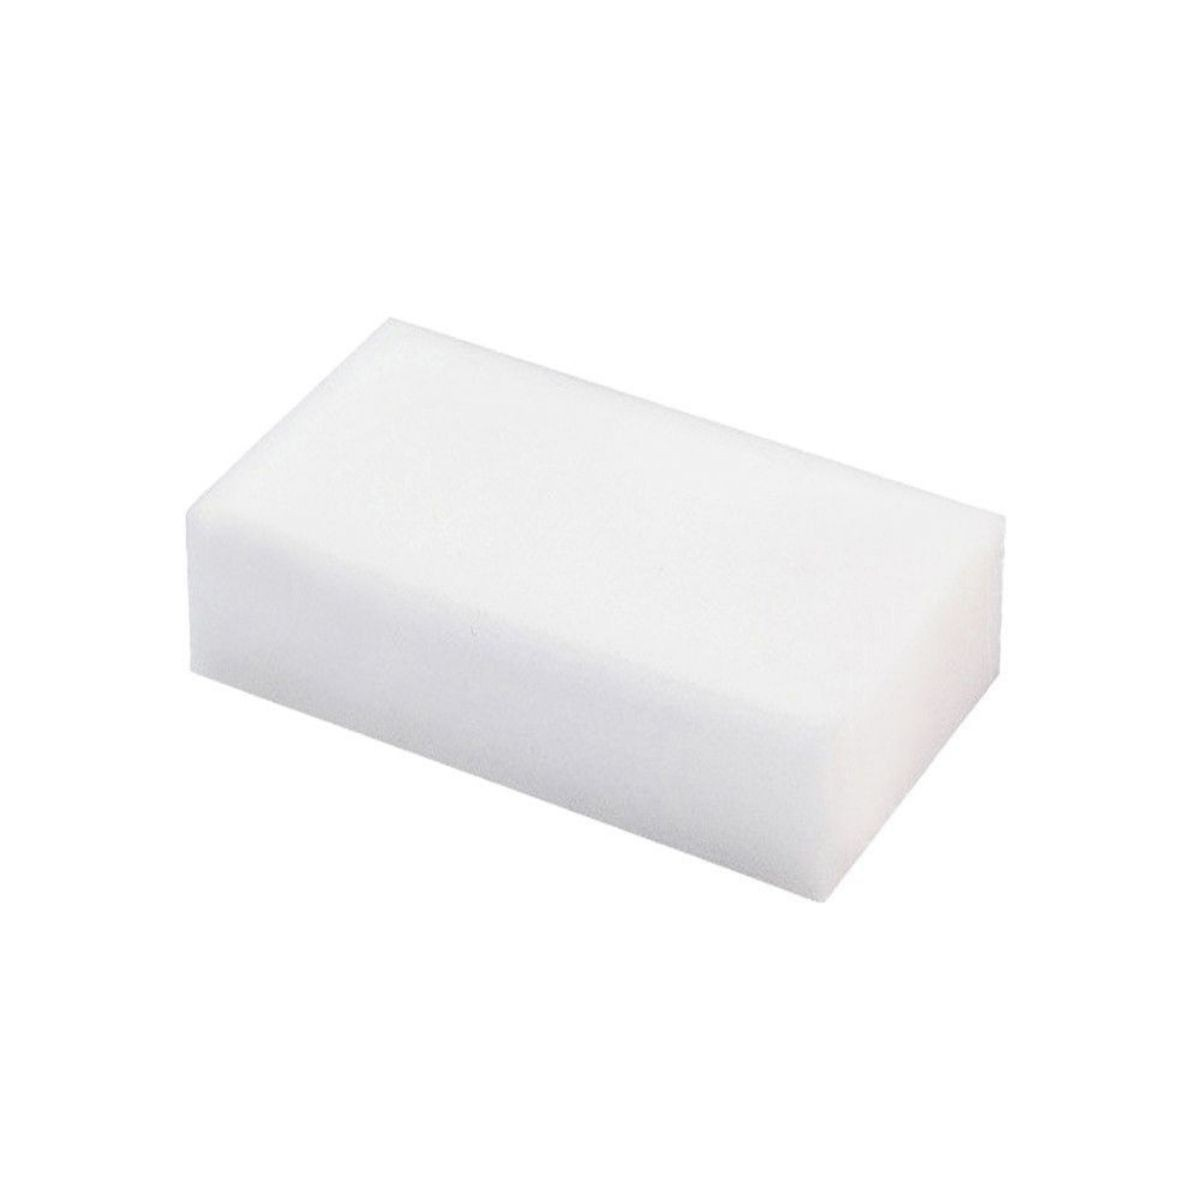 Kit Esponja Mágica Branca Tekbond - 5 Pacotes